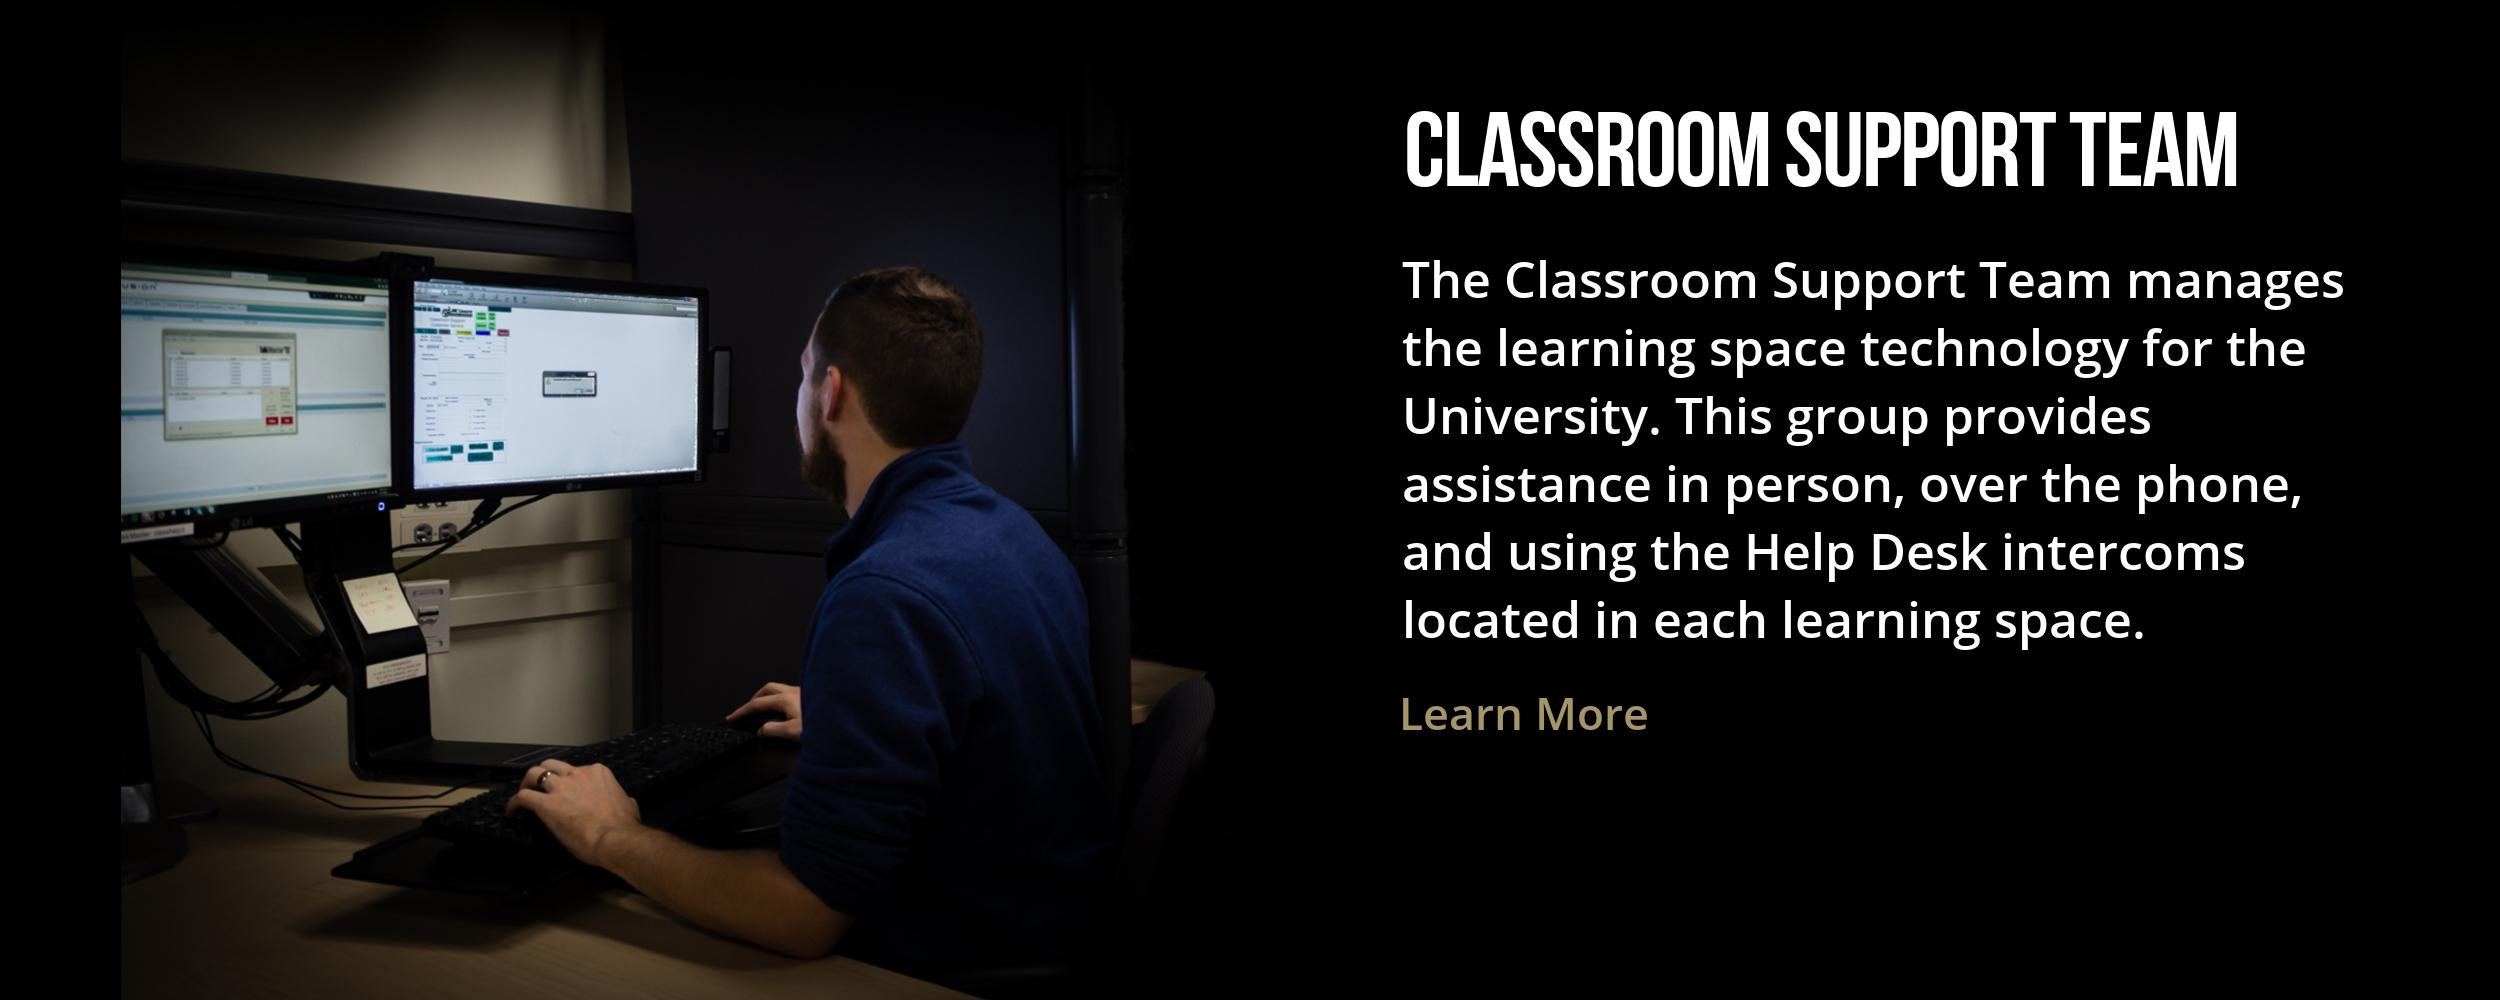 Classroom Support Team